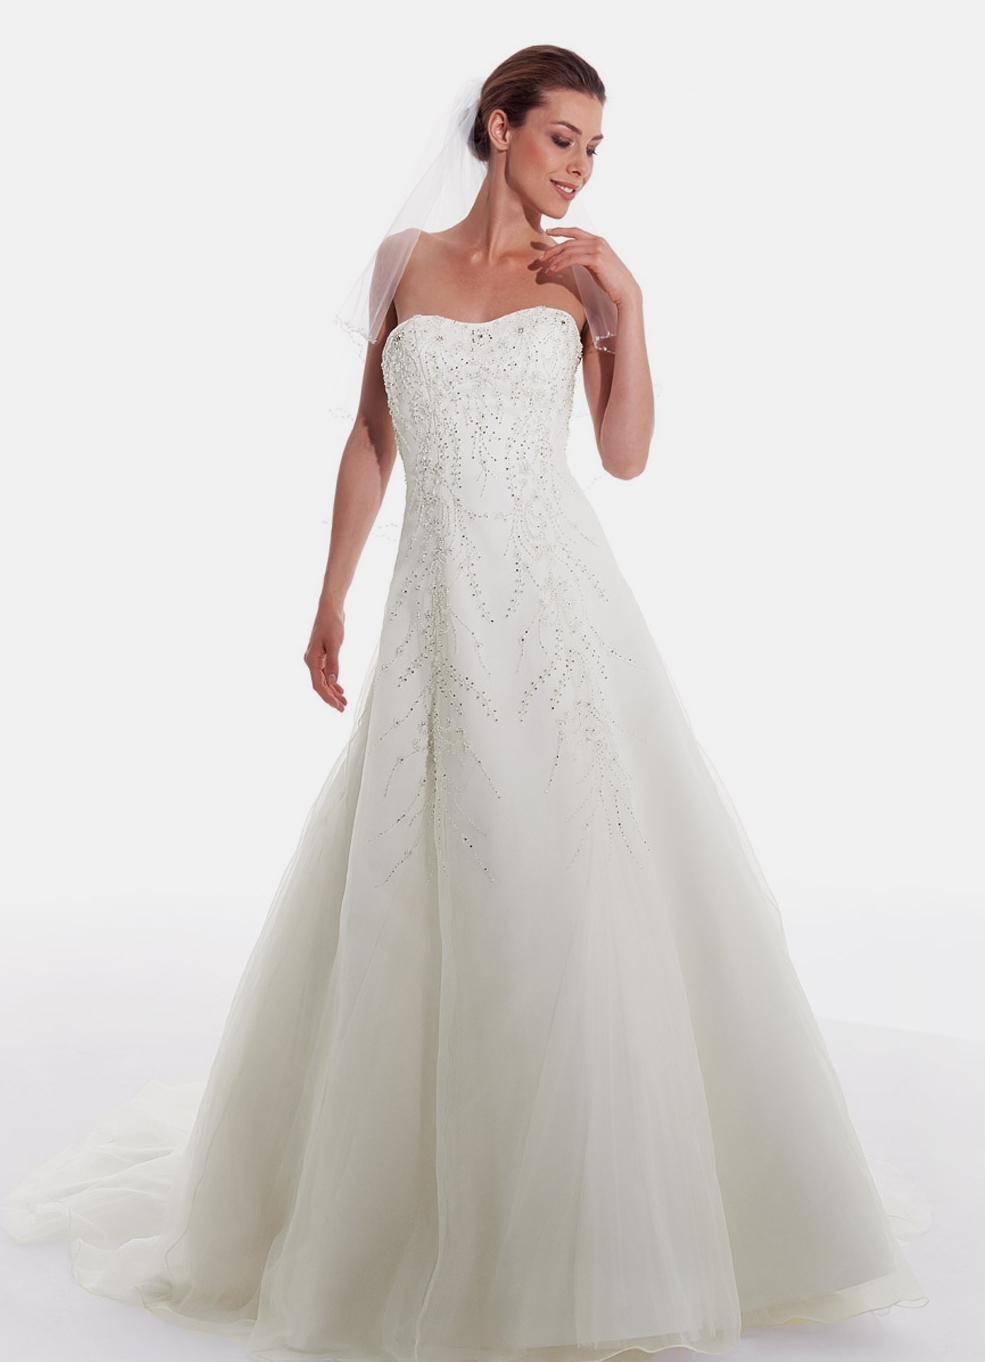 Hochzeitskleid Silvia 715 - Typ: Brautkleid Silvia 715